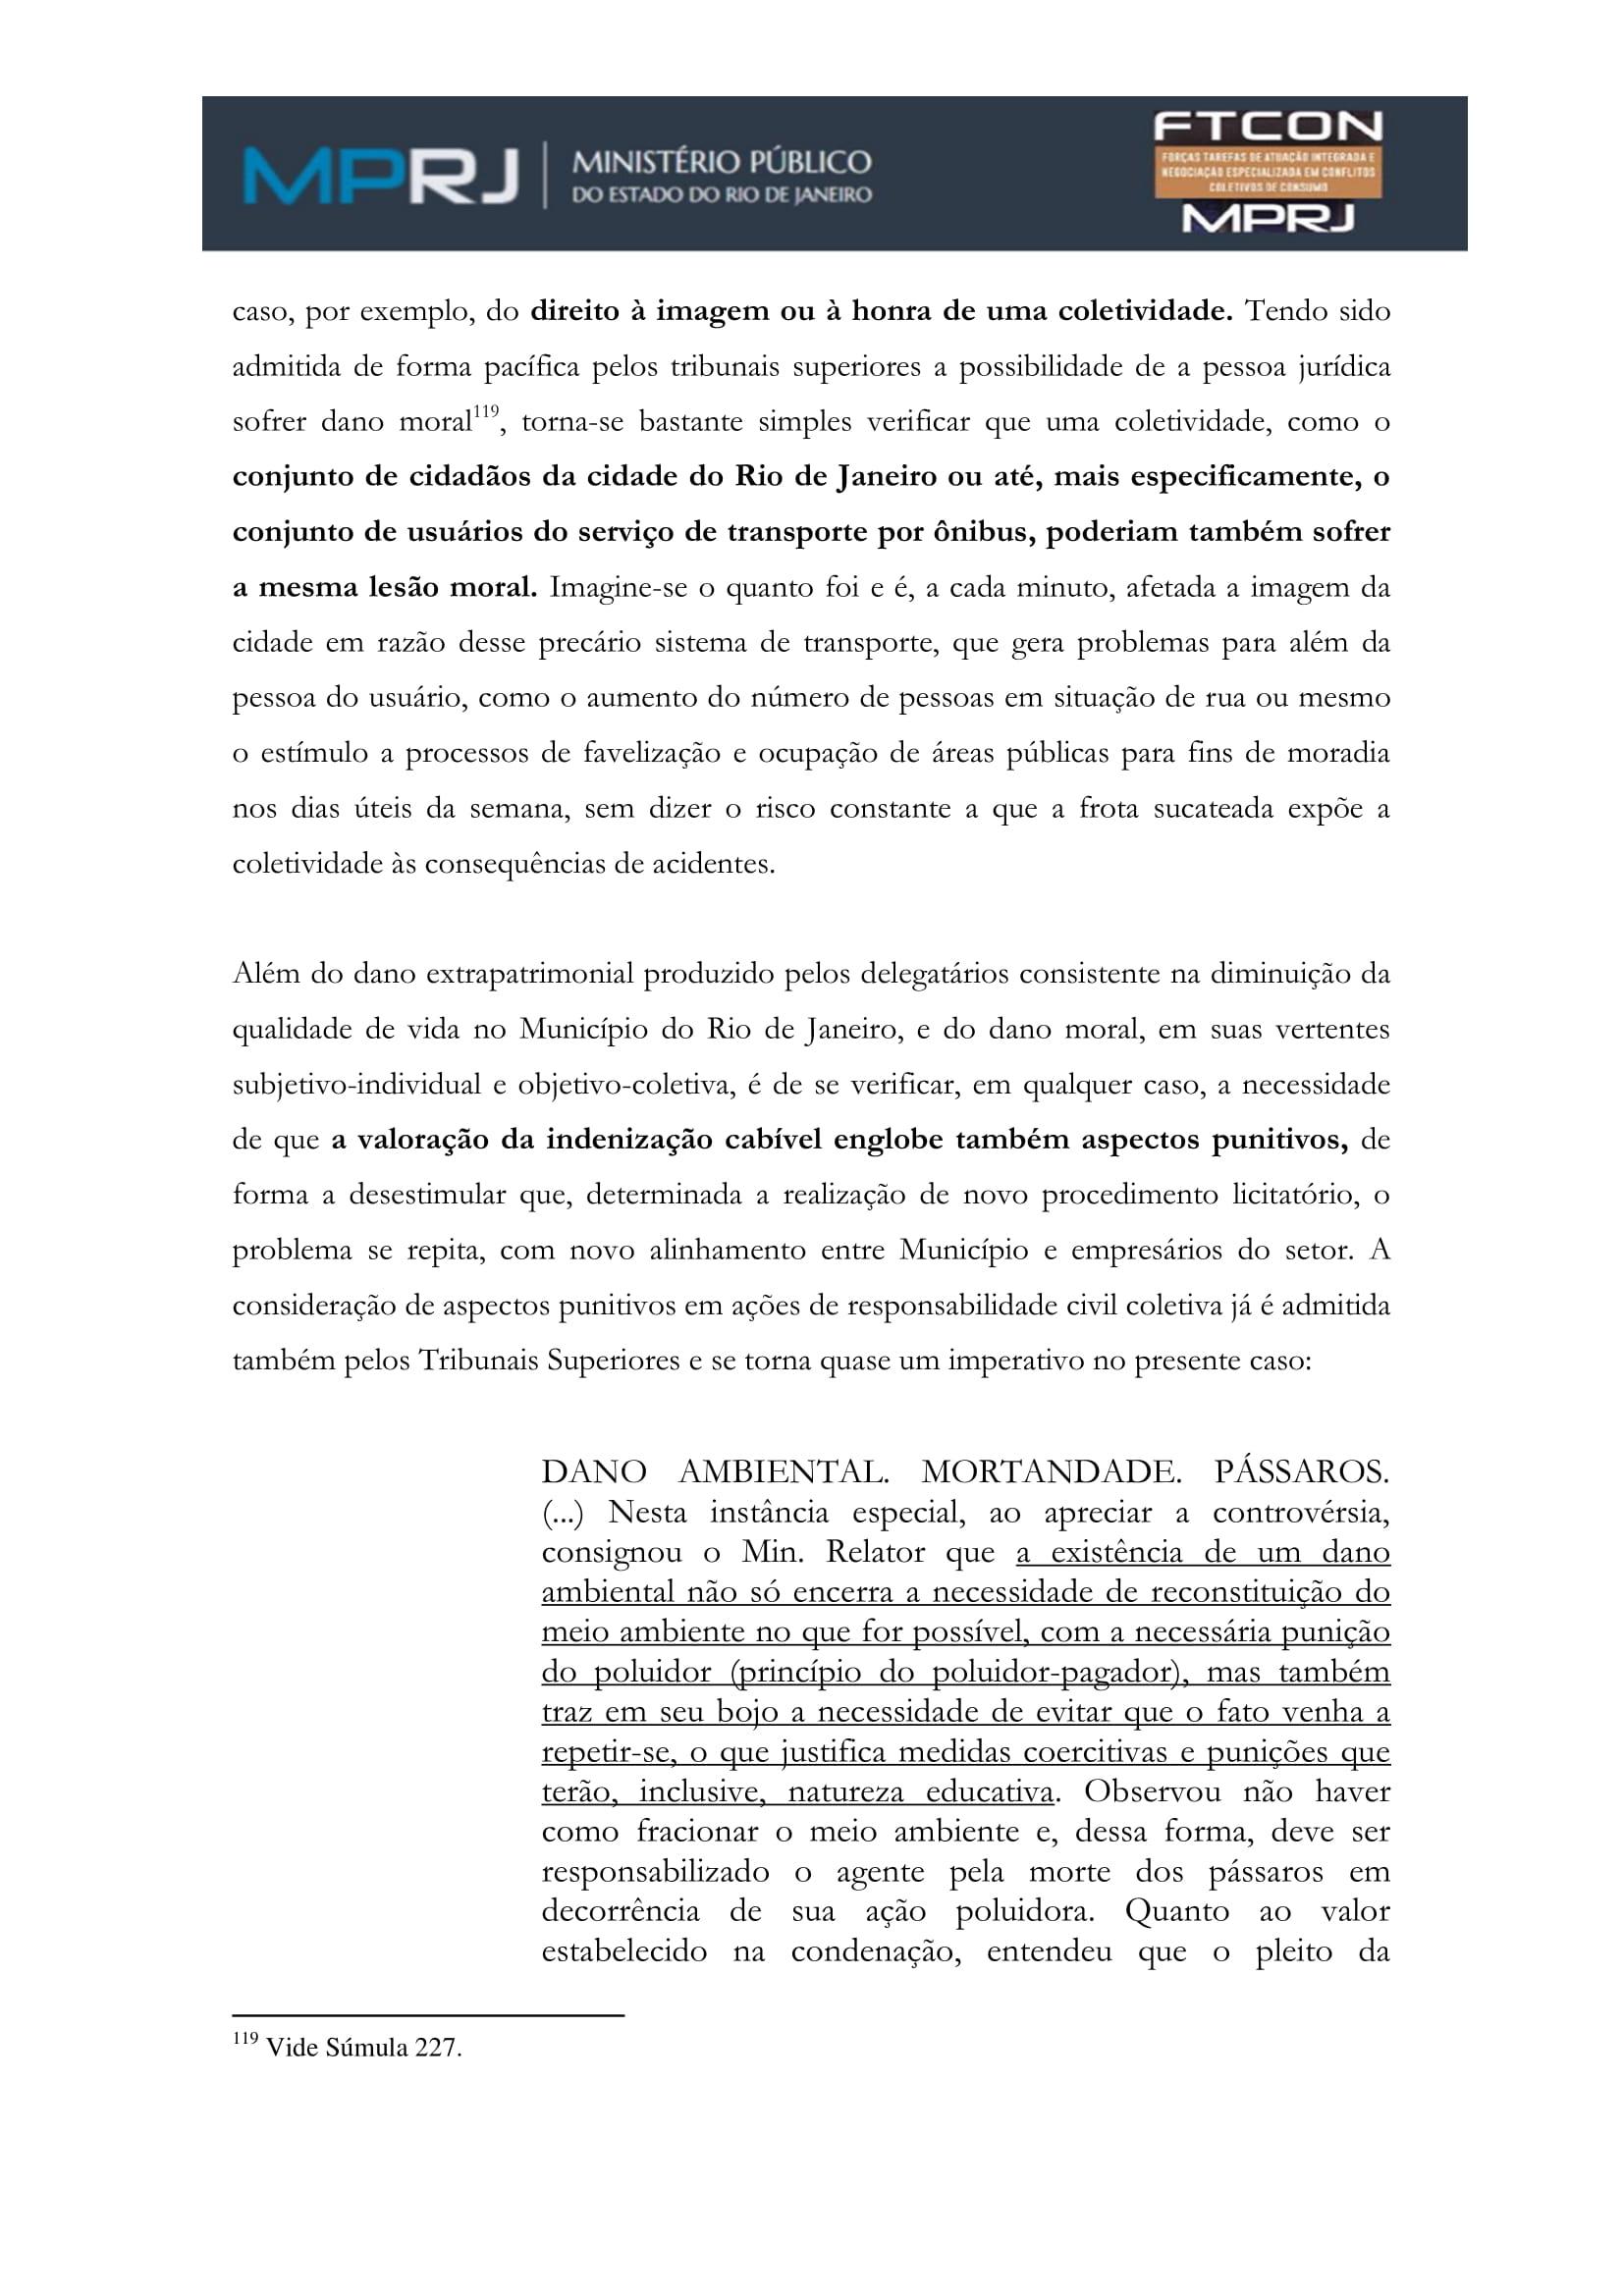 acp_caducidade_onibus_dr_rt-131